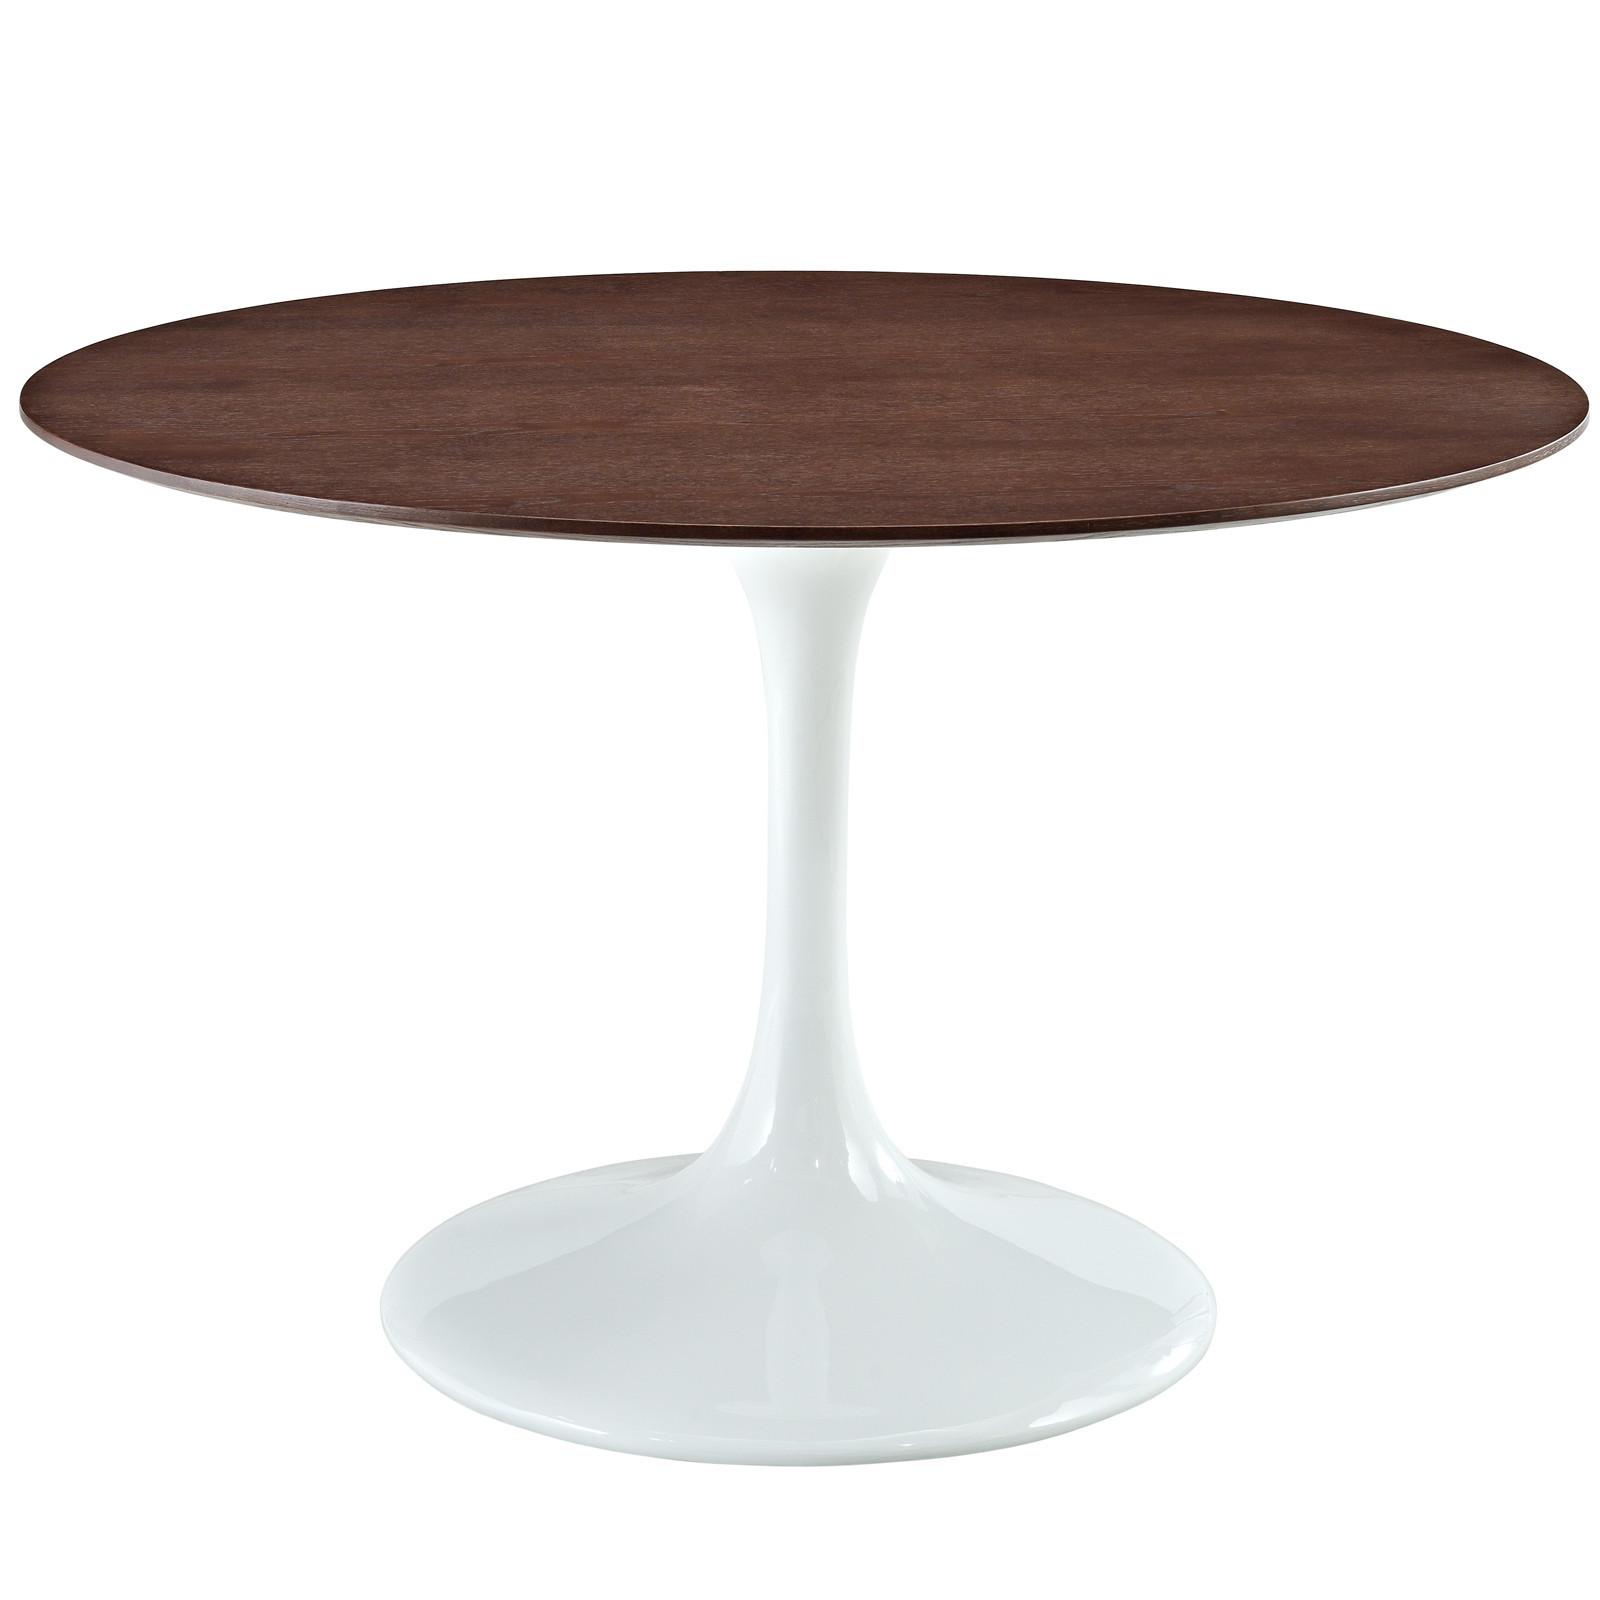 Eero Saarinen Style Tulip Table With Walnut Top In White - White tulip table 48